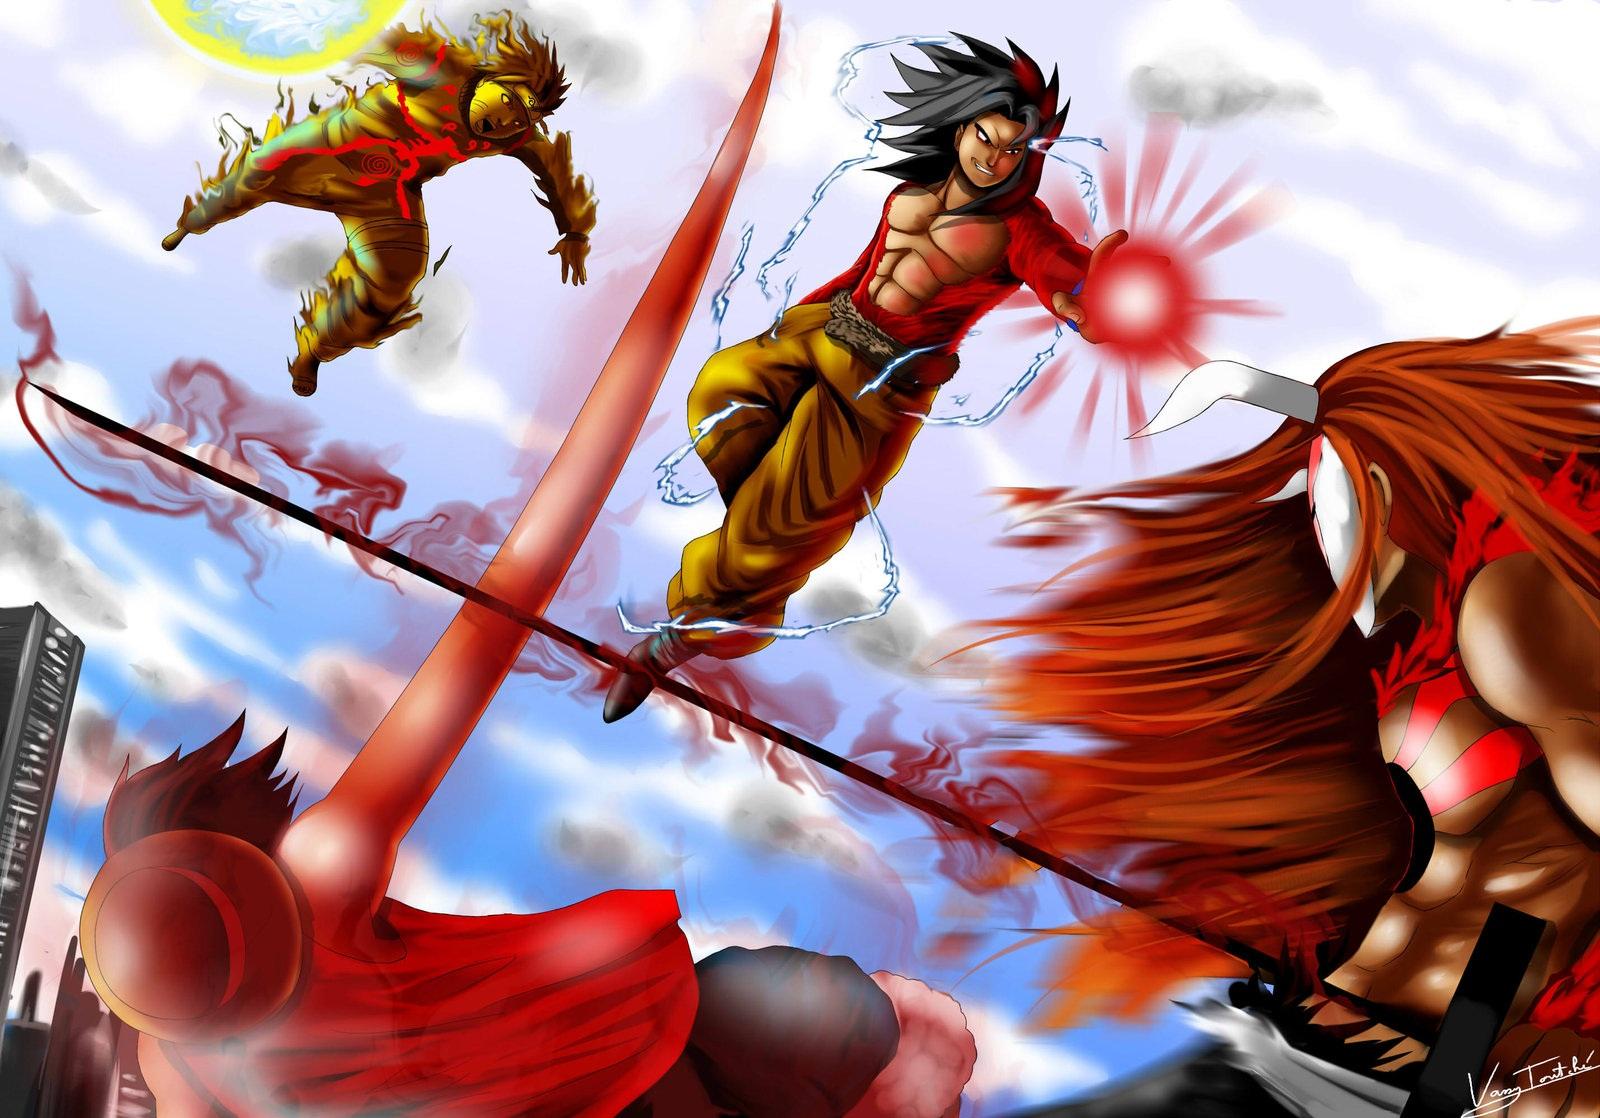 Naruto and Goku Wallpaper 1600x1118